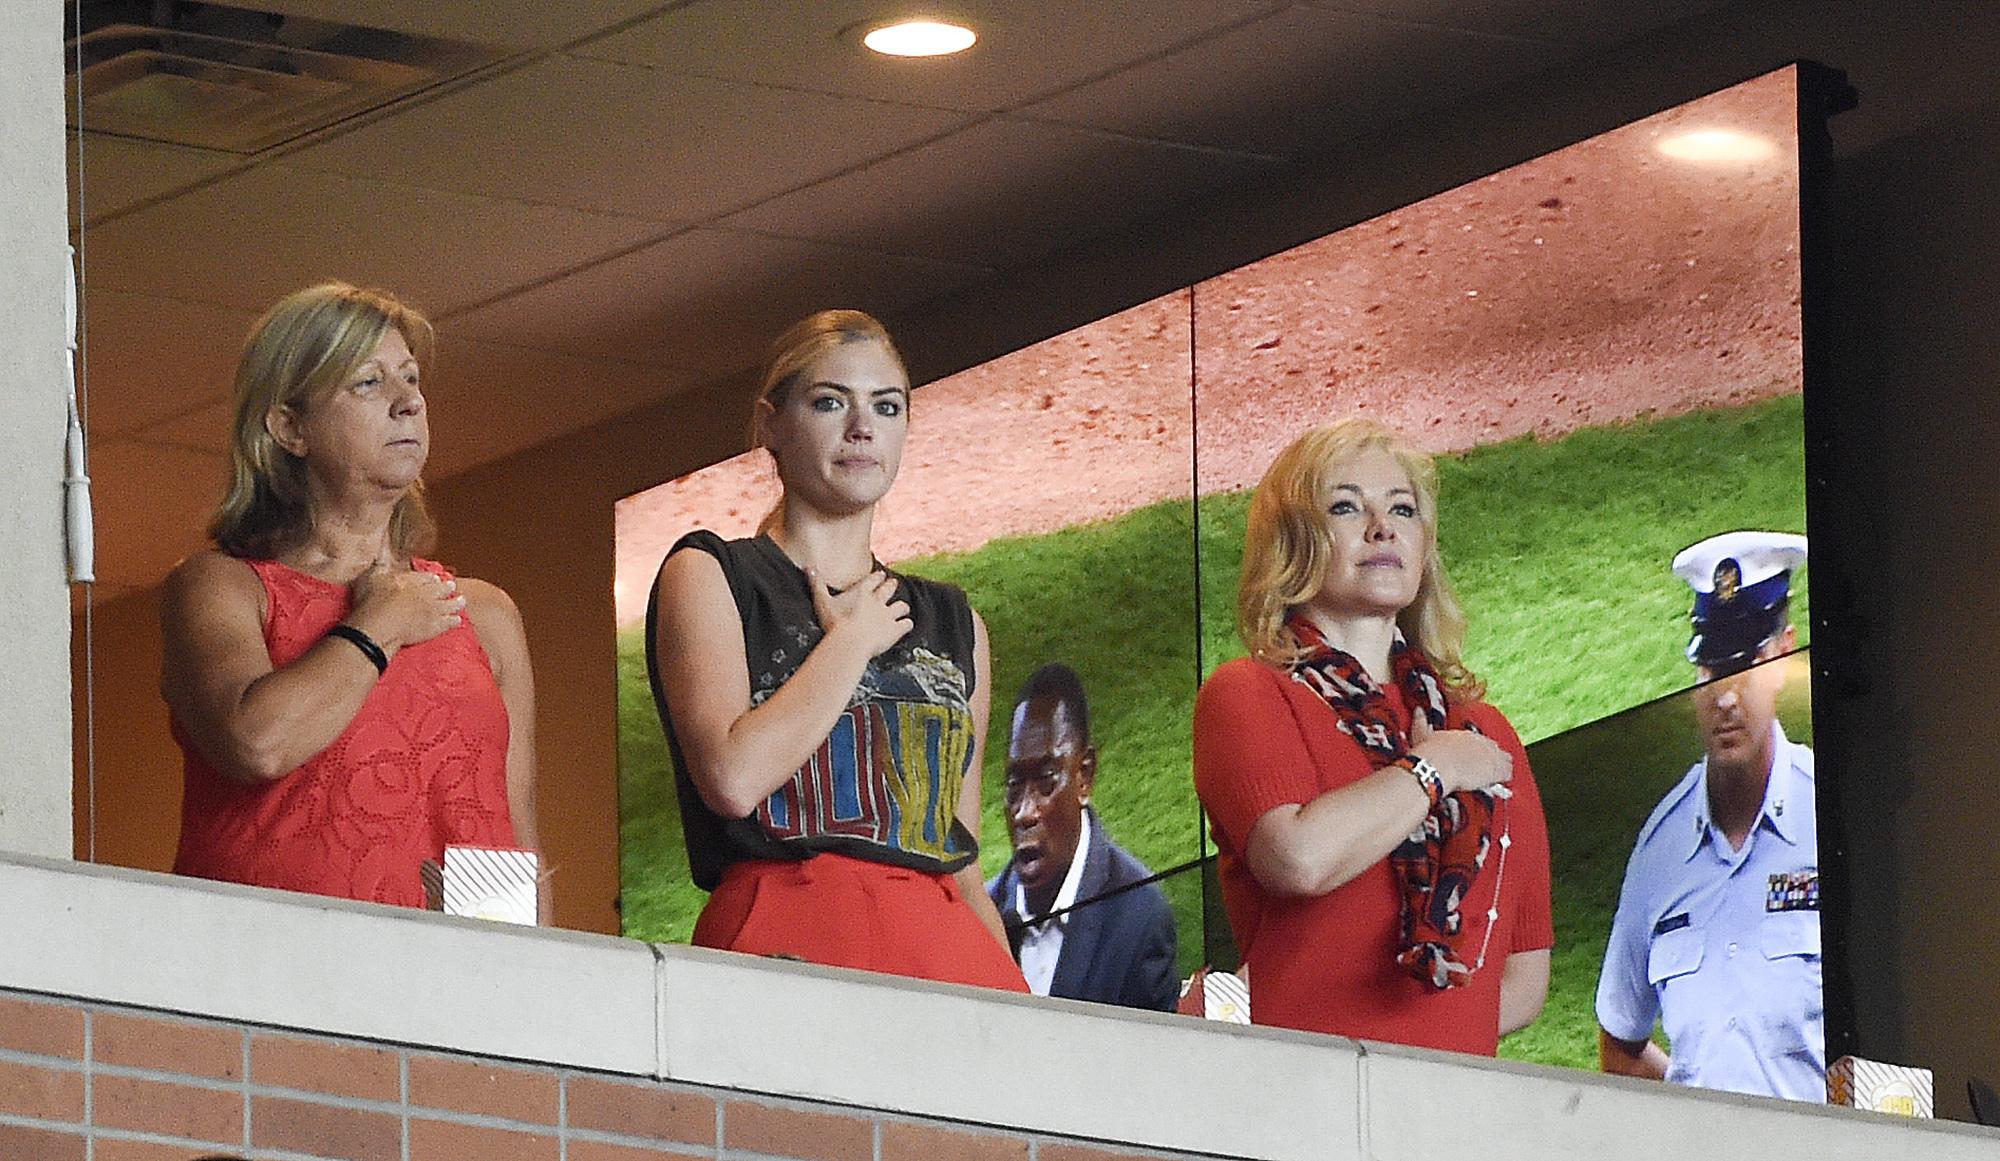 <div class='meta'><div class='origin-logo' data-origin='AP'></div><span class='caption-text' data-credit='AP'>The outfits of Kate Upton during Astros games</span></div>